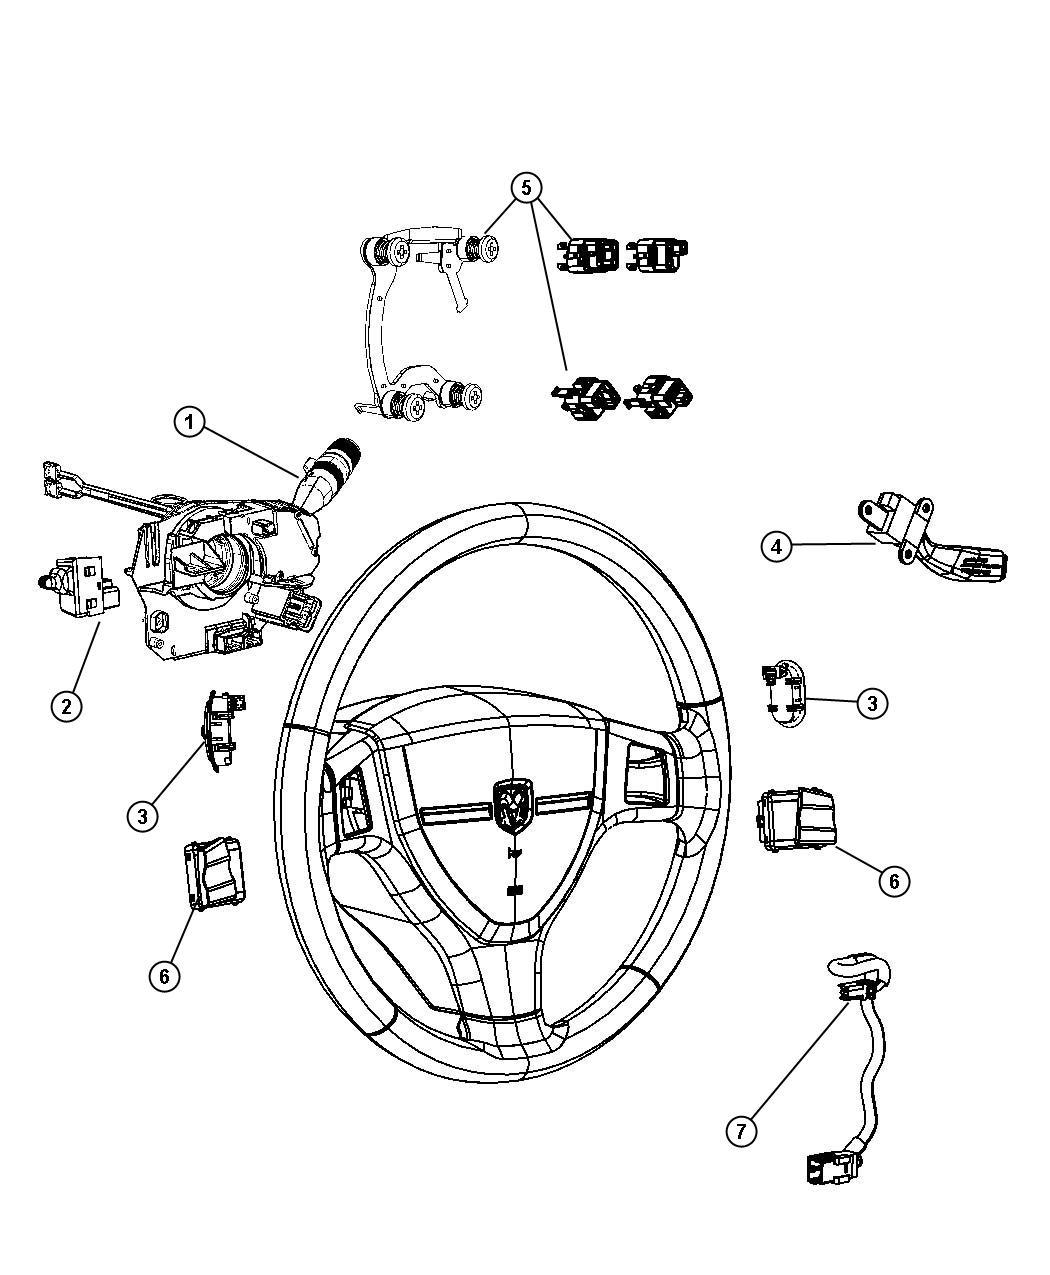 Dodge Ram Steering Column Parts Diagram